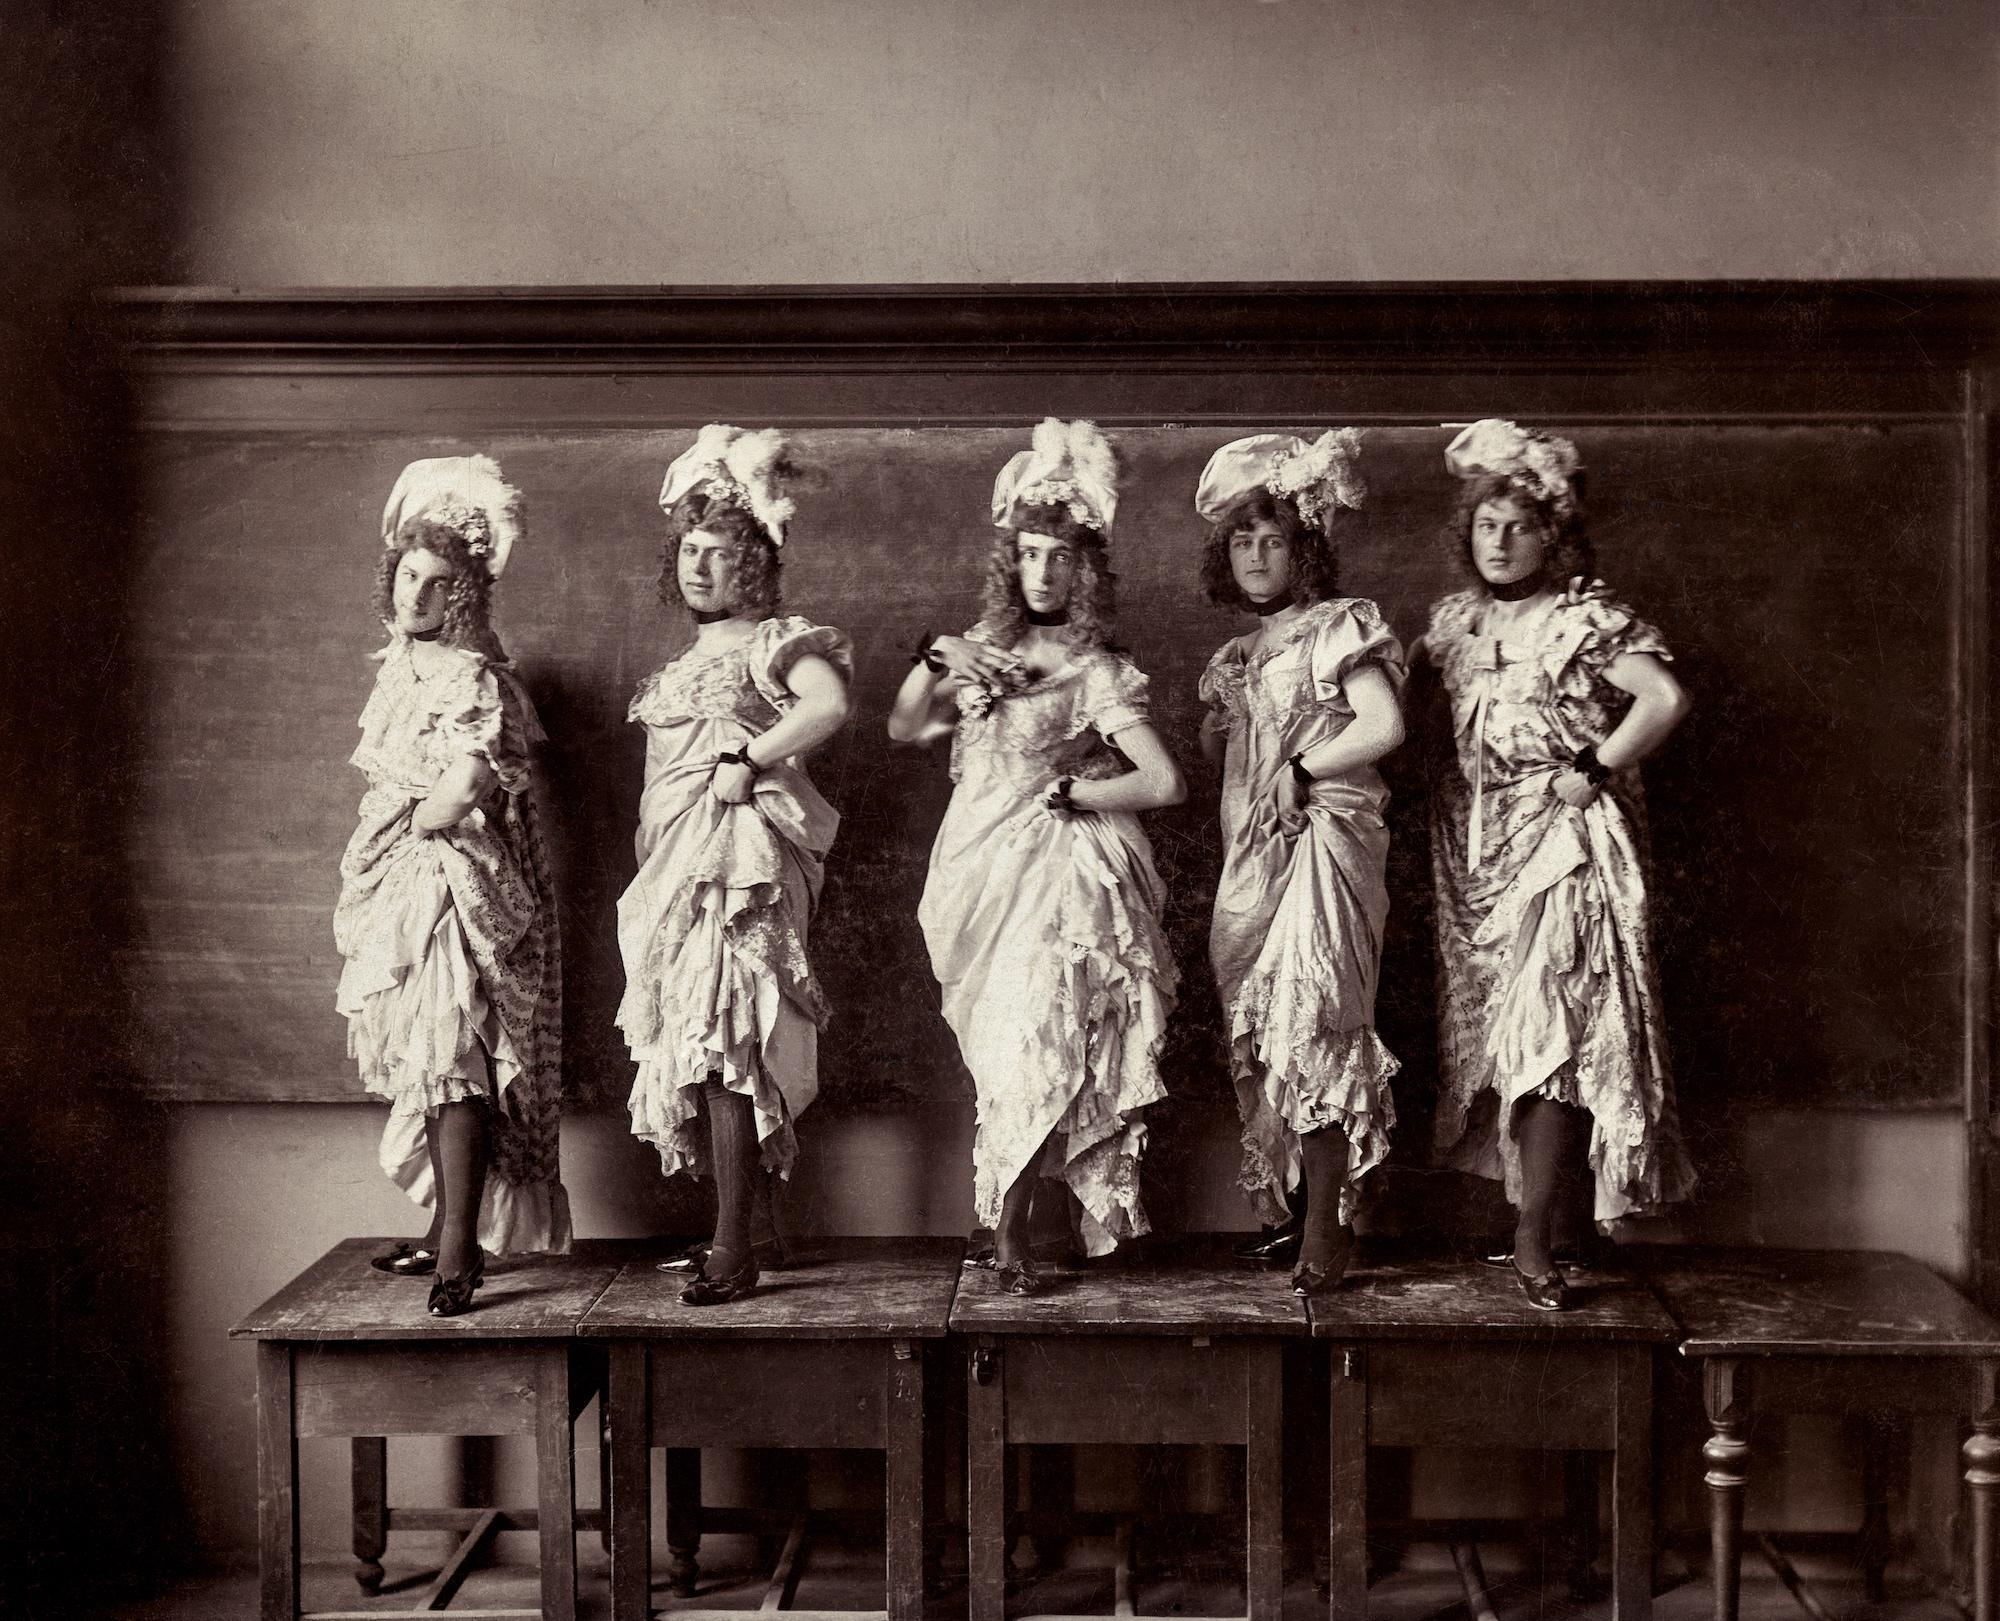 Five performers on a platform. Handwritten on verso 'Haris Fifi, Zerneck Joe, Gaby Zerkovitz, Stasik Ficzin Mehelyi Mimi'. Albumen print, Hungary, circa 1900.